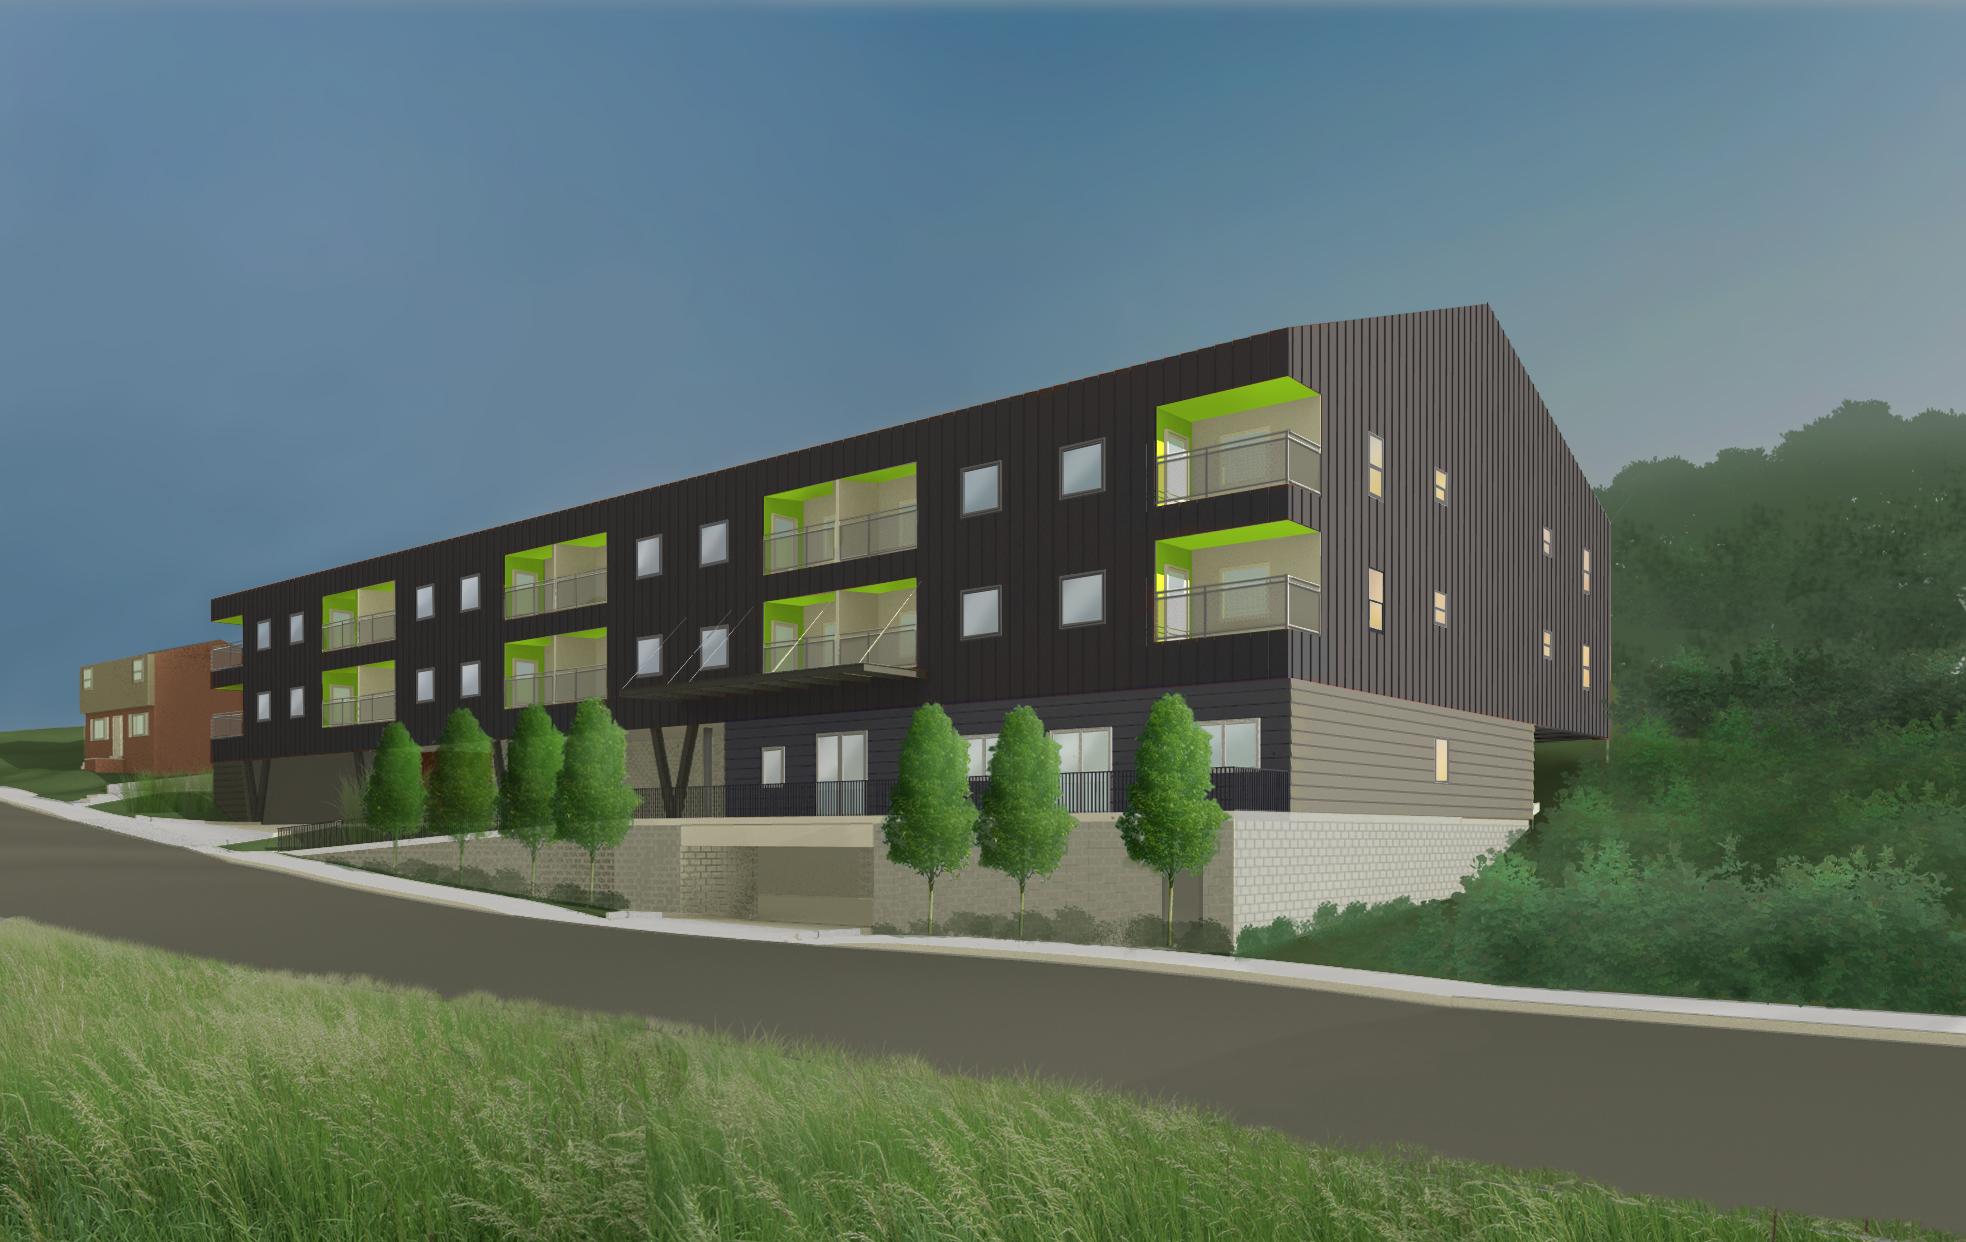 Rendering courtesy of Loysen + Kreuthmeier Architects